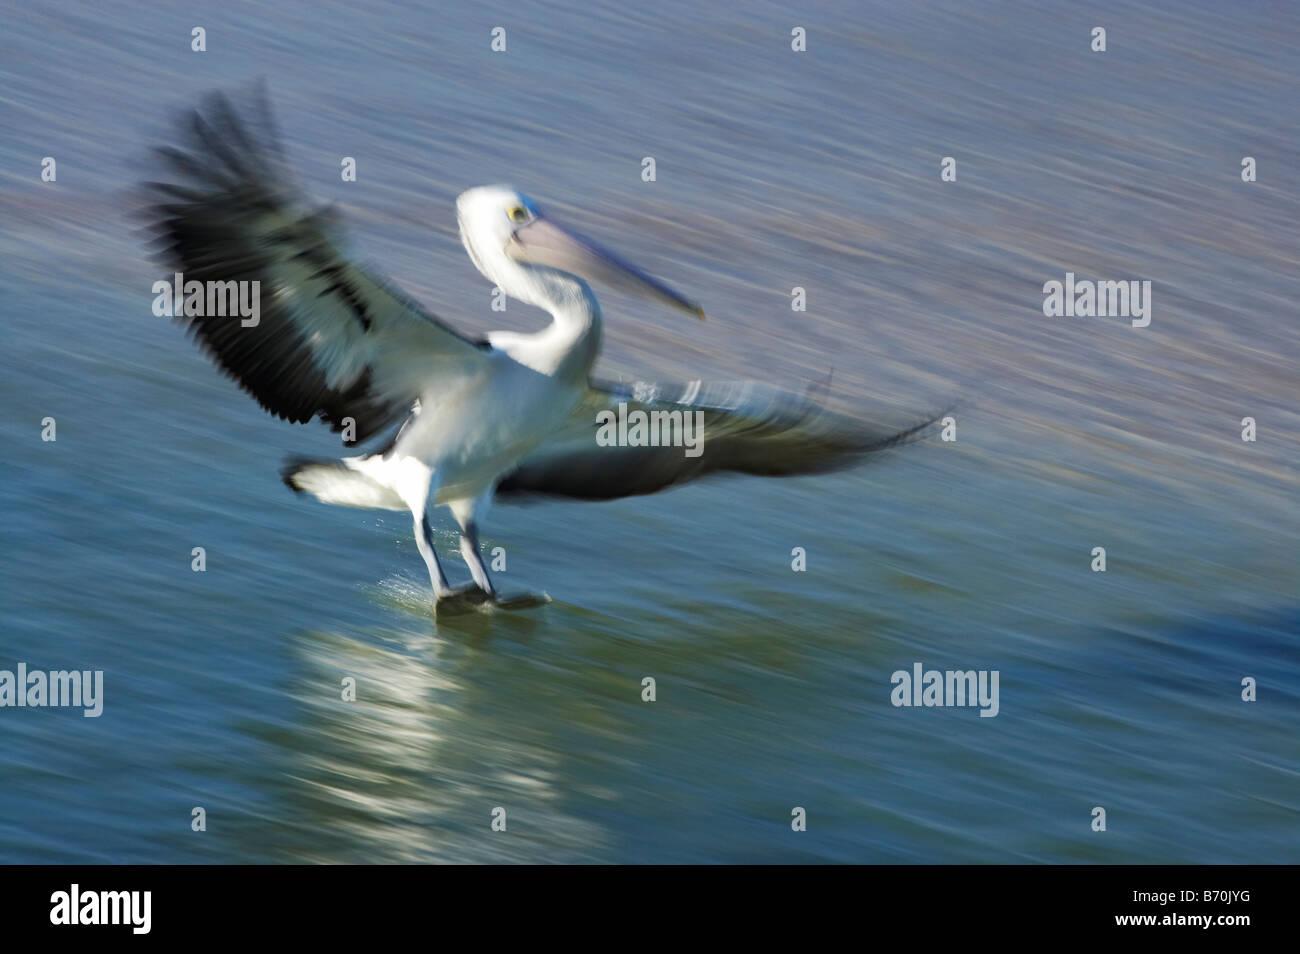 Australian Pelican Pelecanus conspicillatus Landing at The Entrance New South Wales Australia - Stock Image